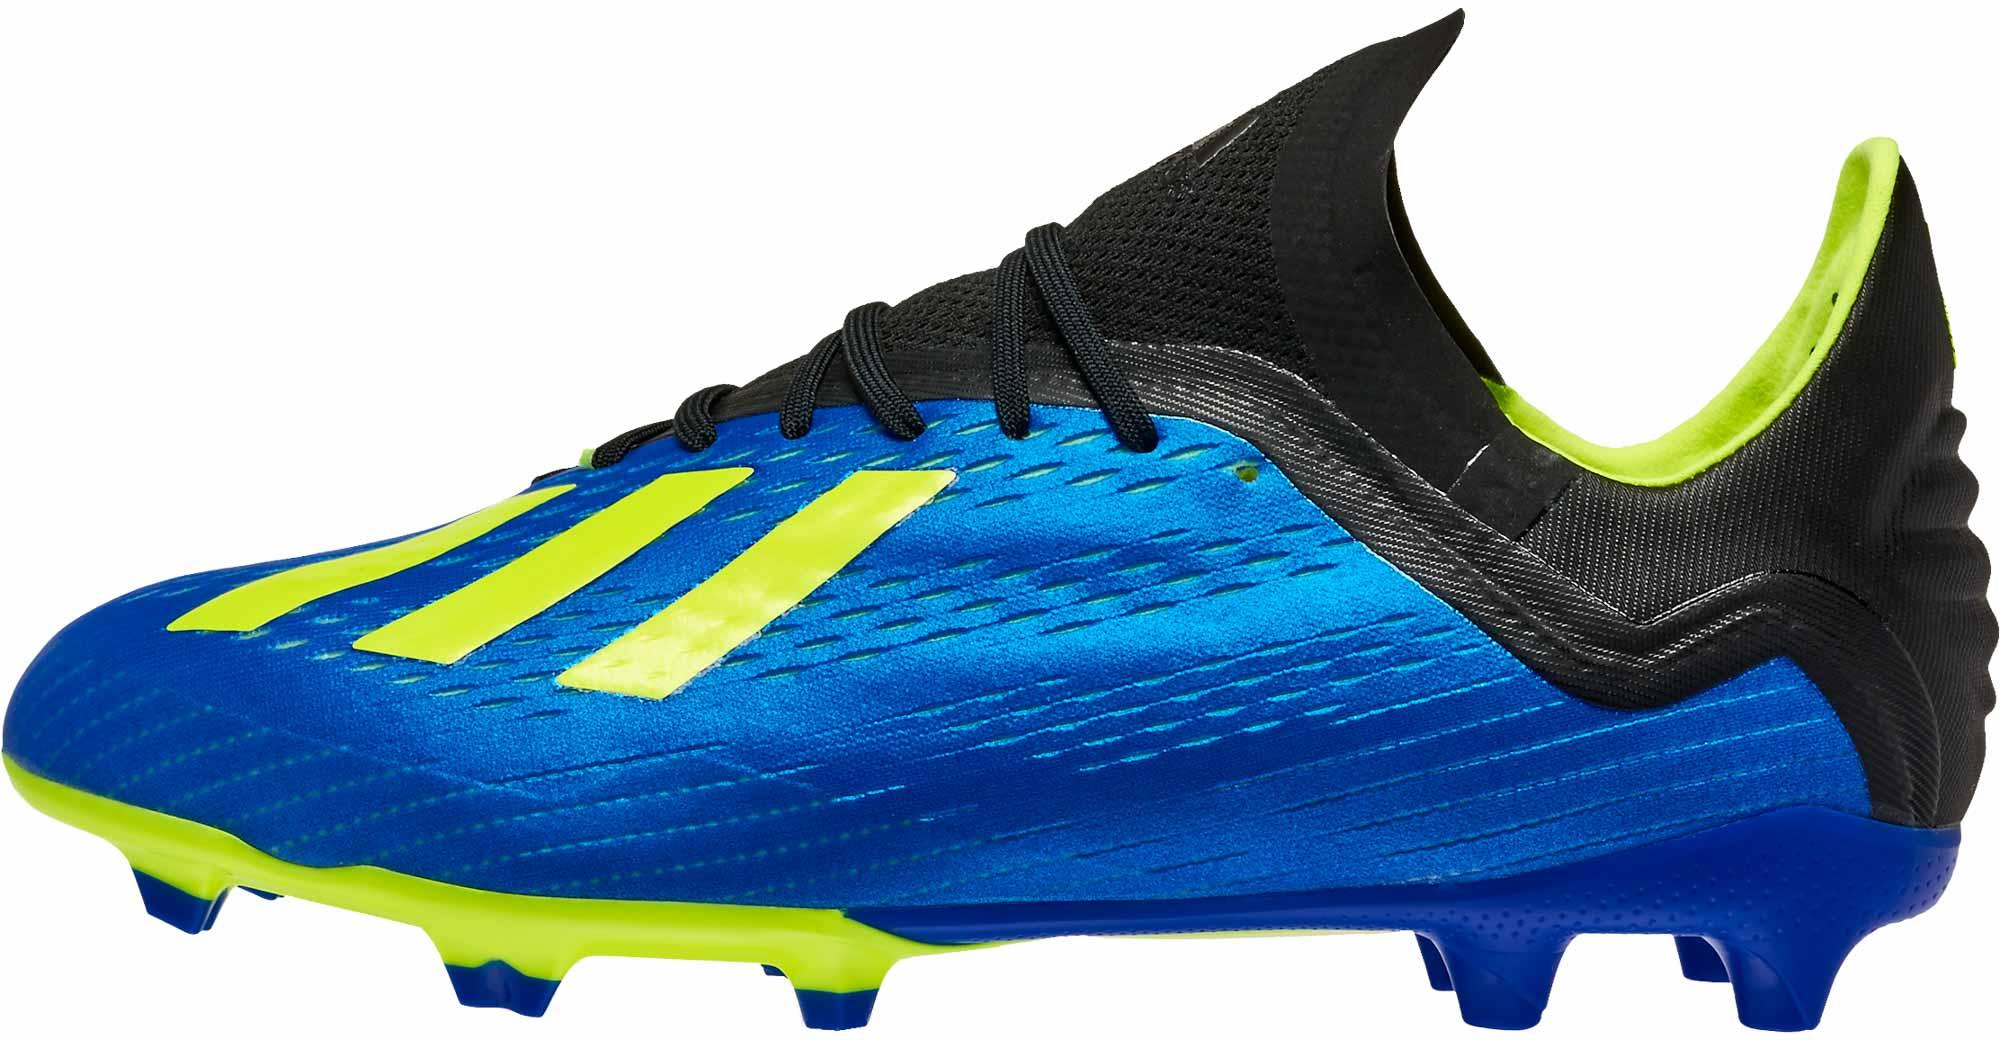 941bf70e9 adidas X 18.1 FG - Youth - Football Blue/Solar Yellow/Black - Soccer ...